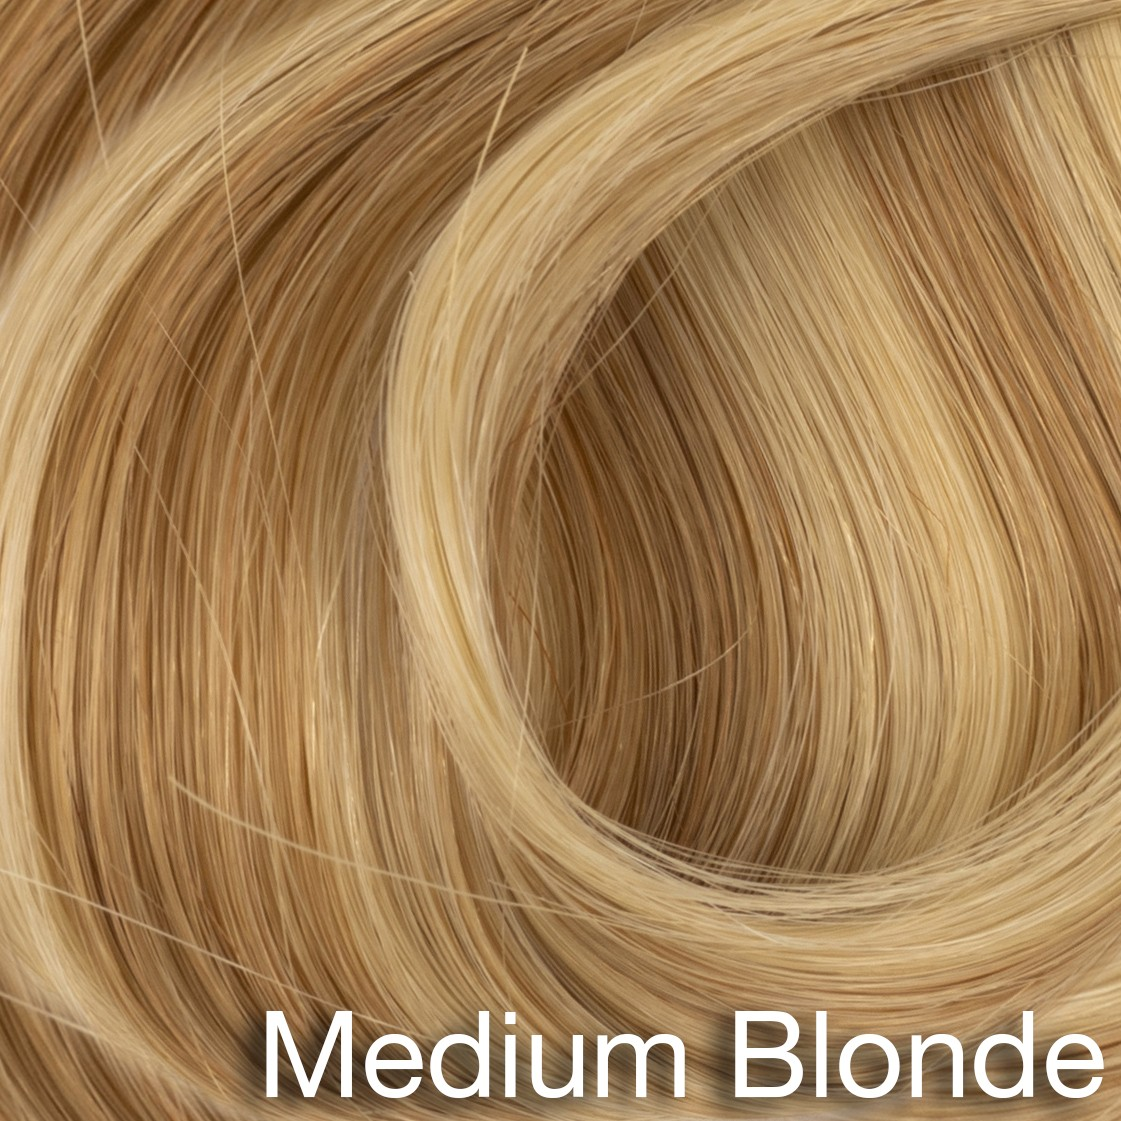 Medium Blond